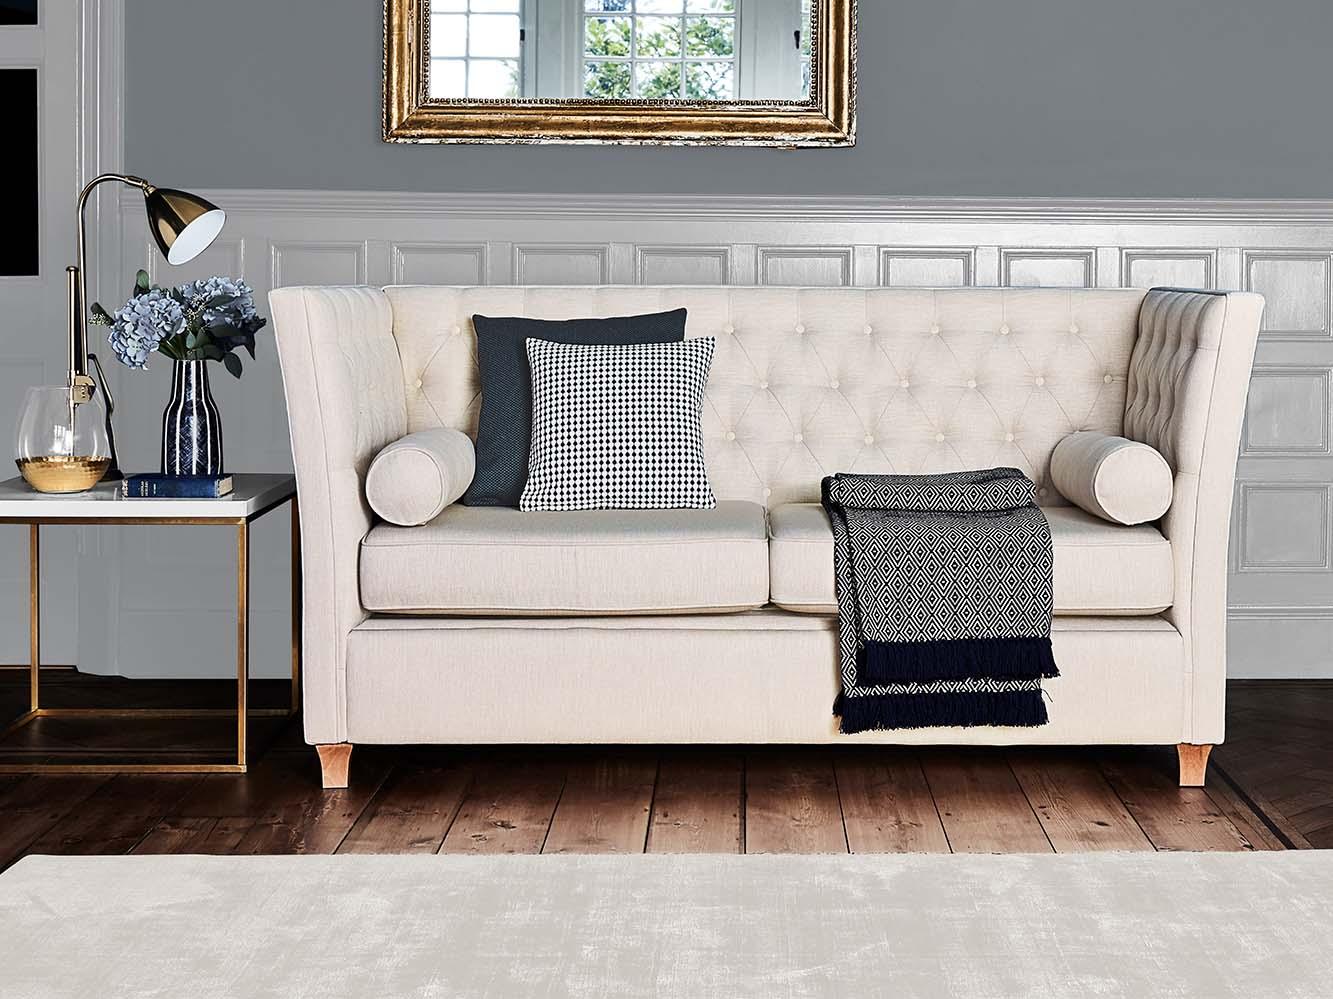 1920s inspired sofa